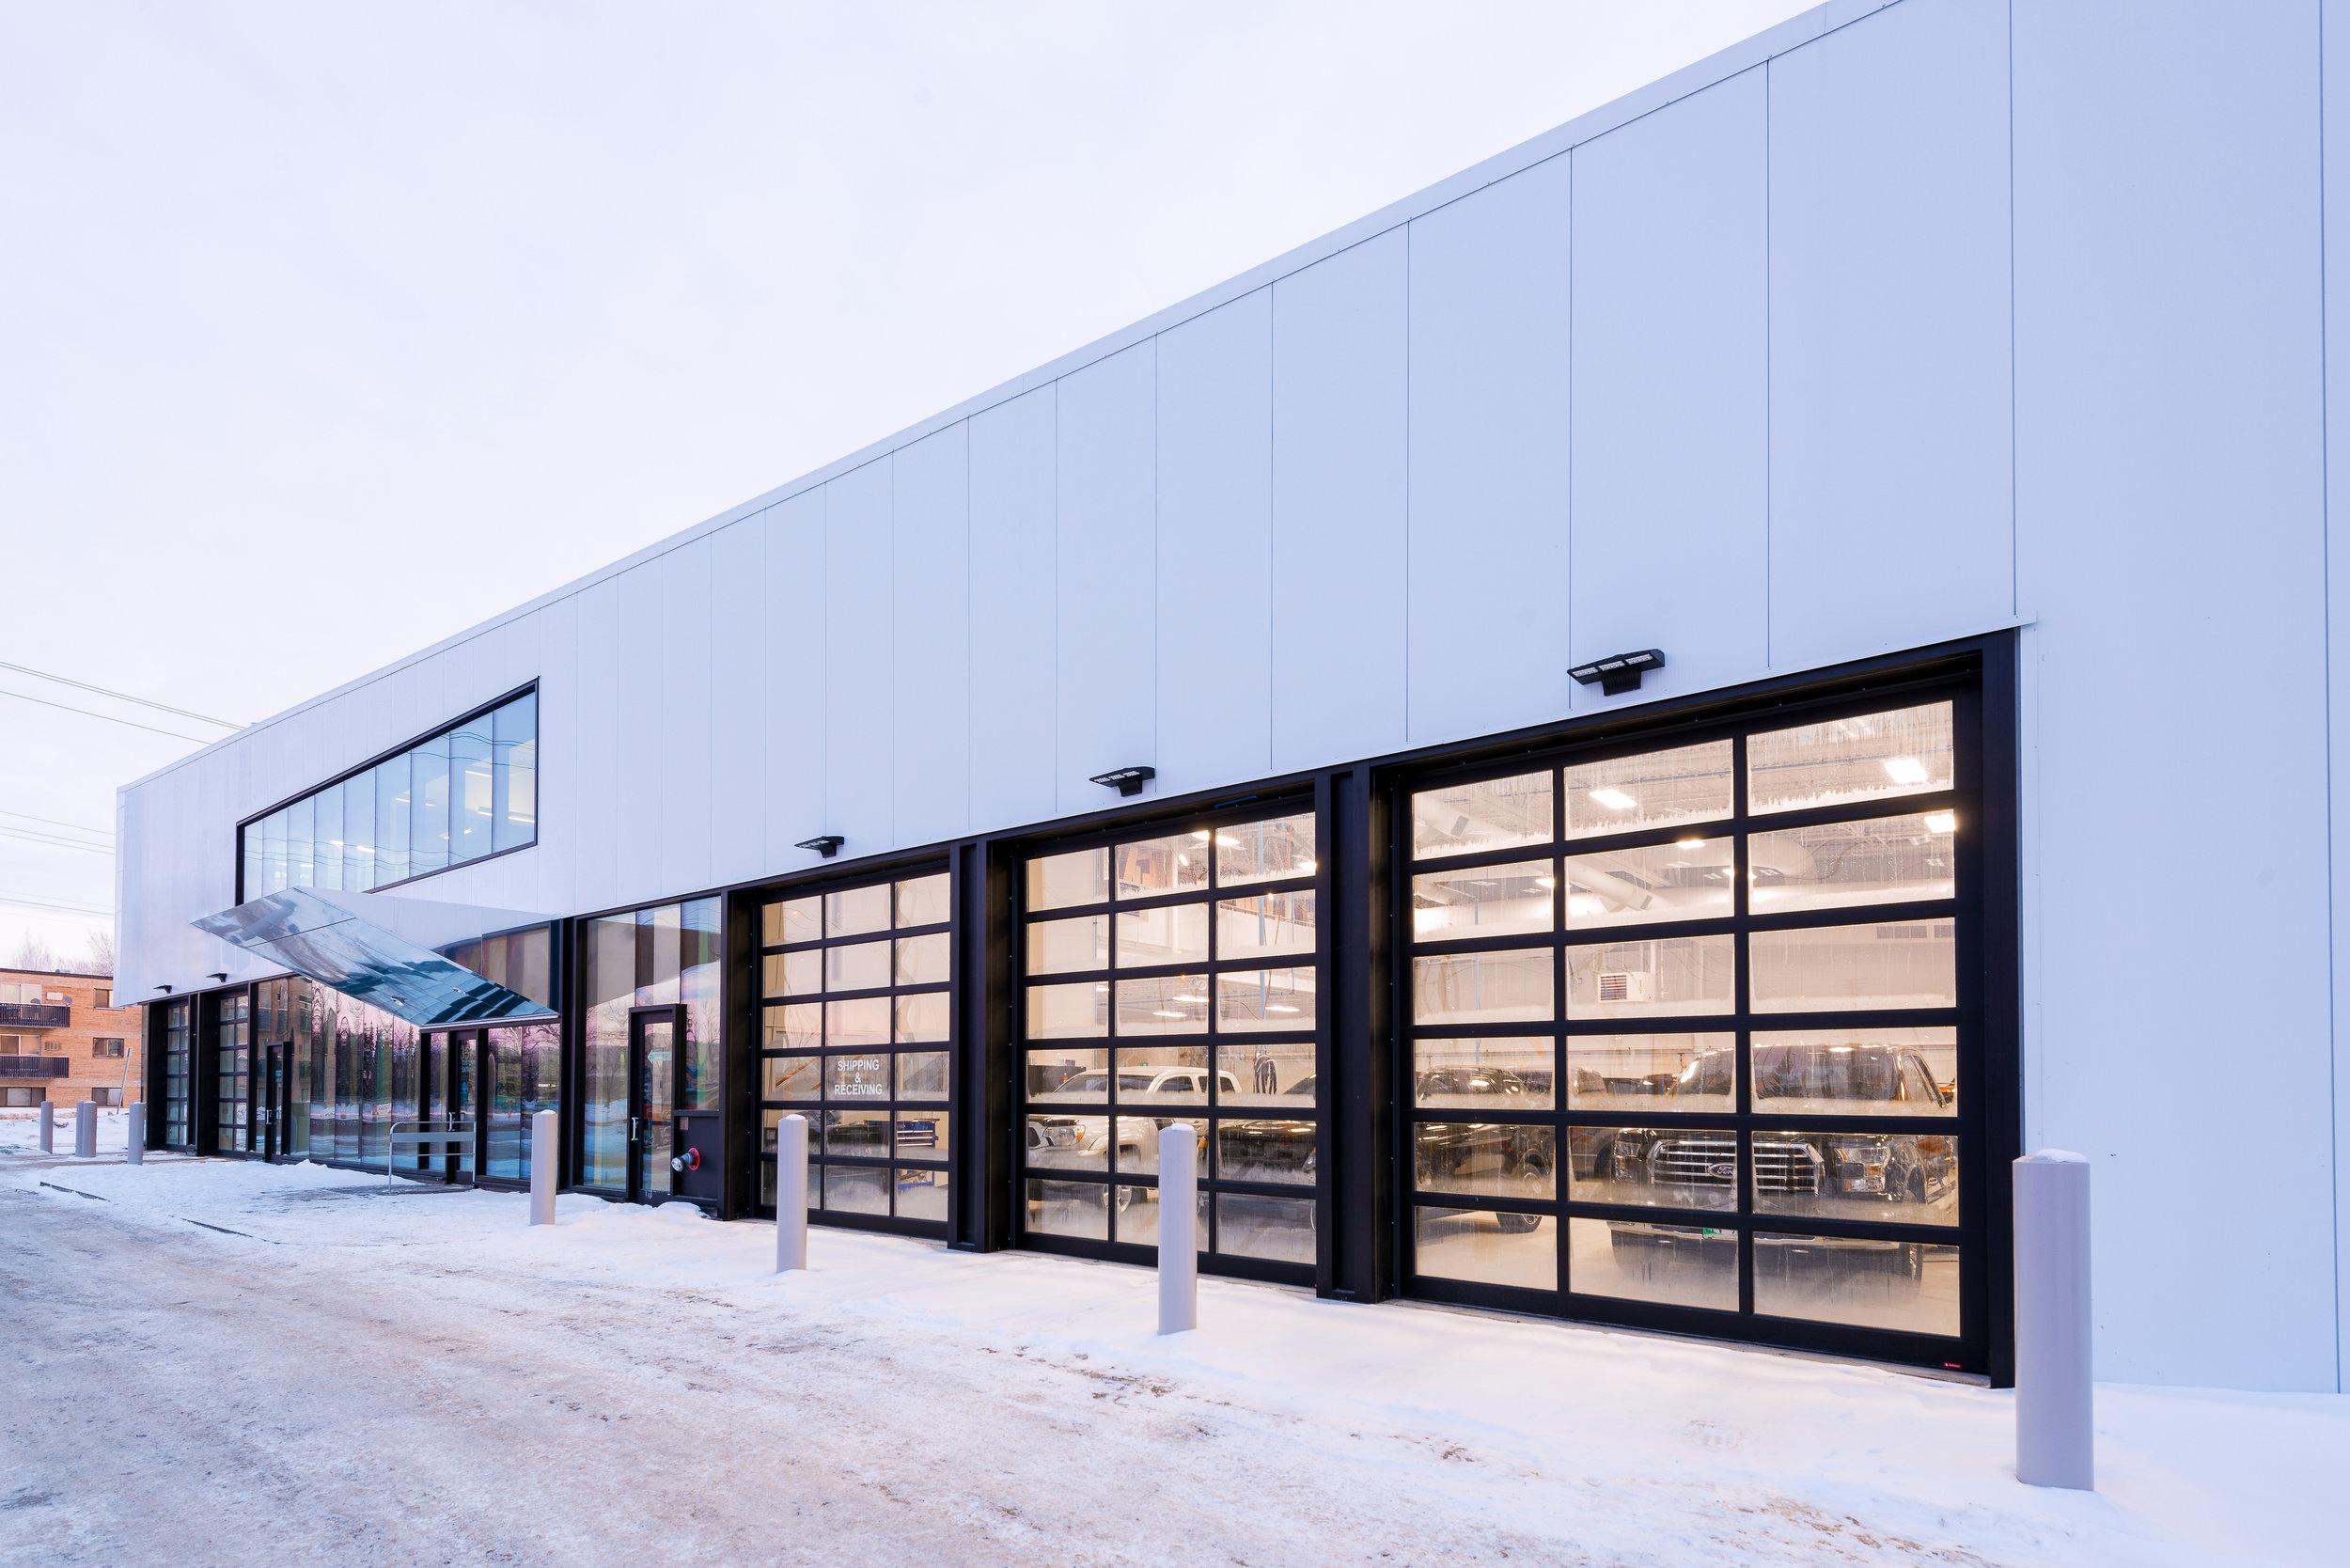 River City Ford Autobody_ Winnipeg Renovation2.jpg